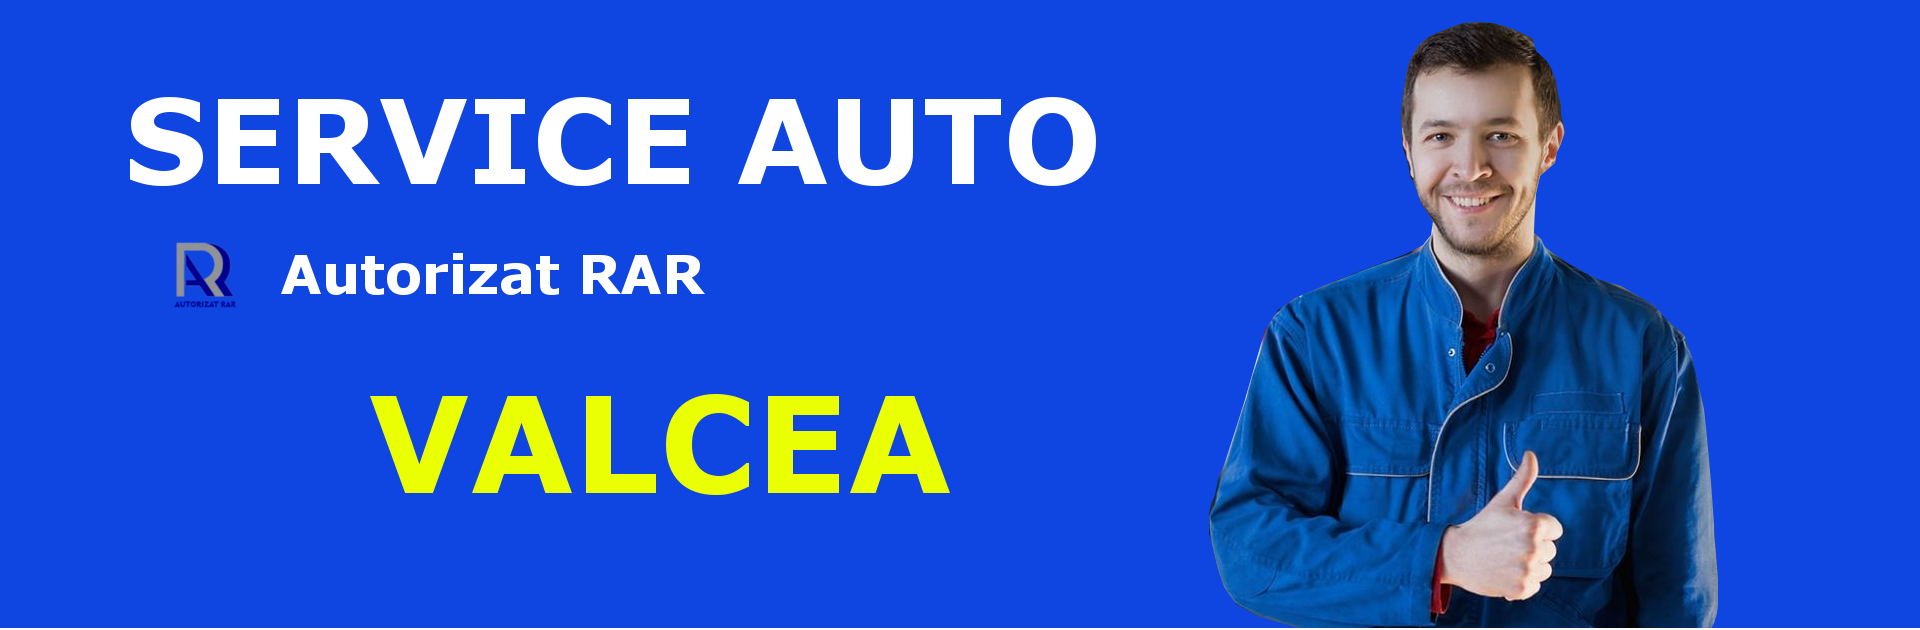 Banner service VALCEA